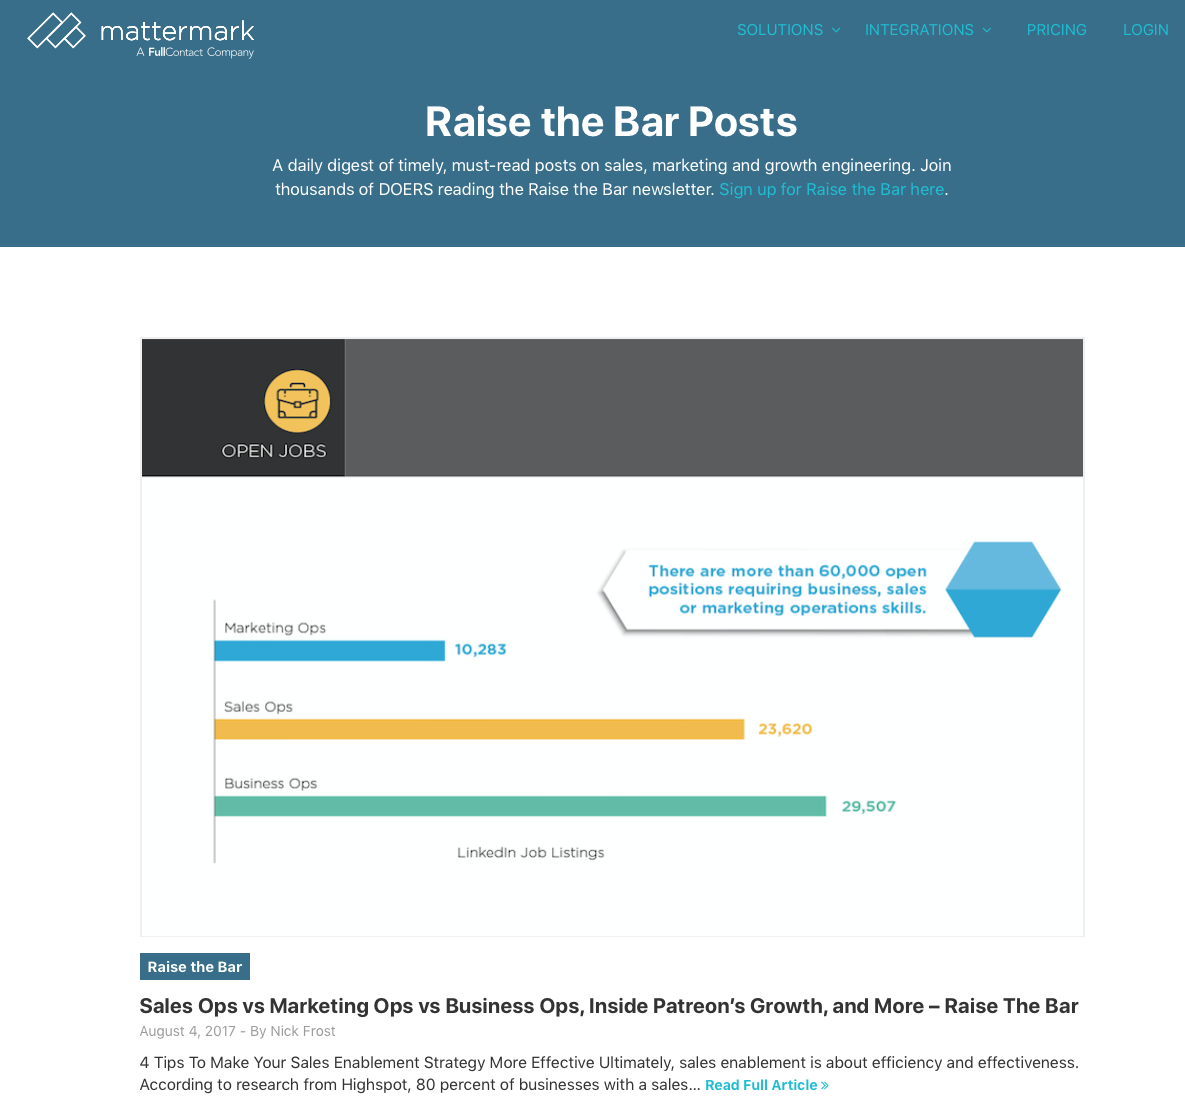 Raise the Bar by Mattermark